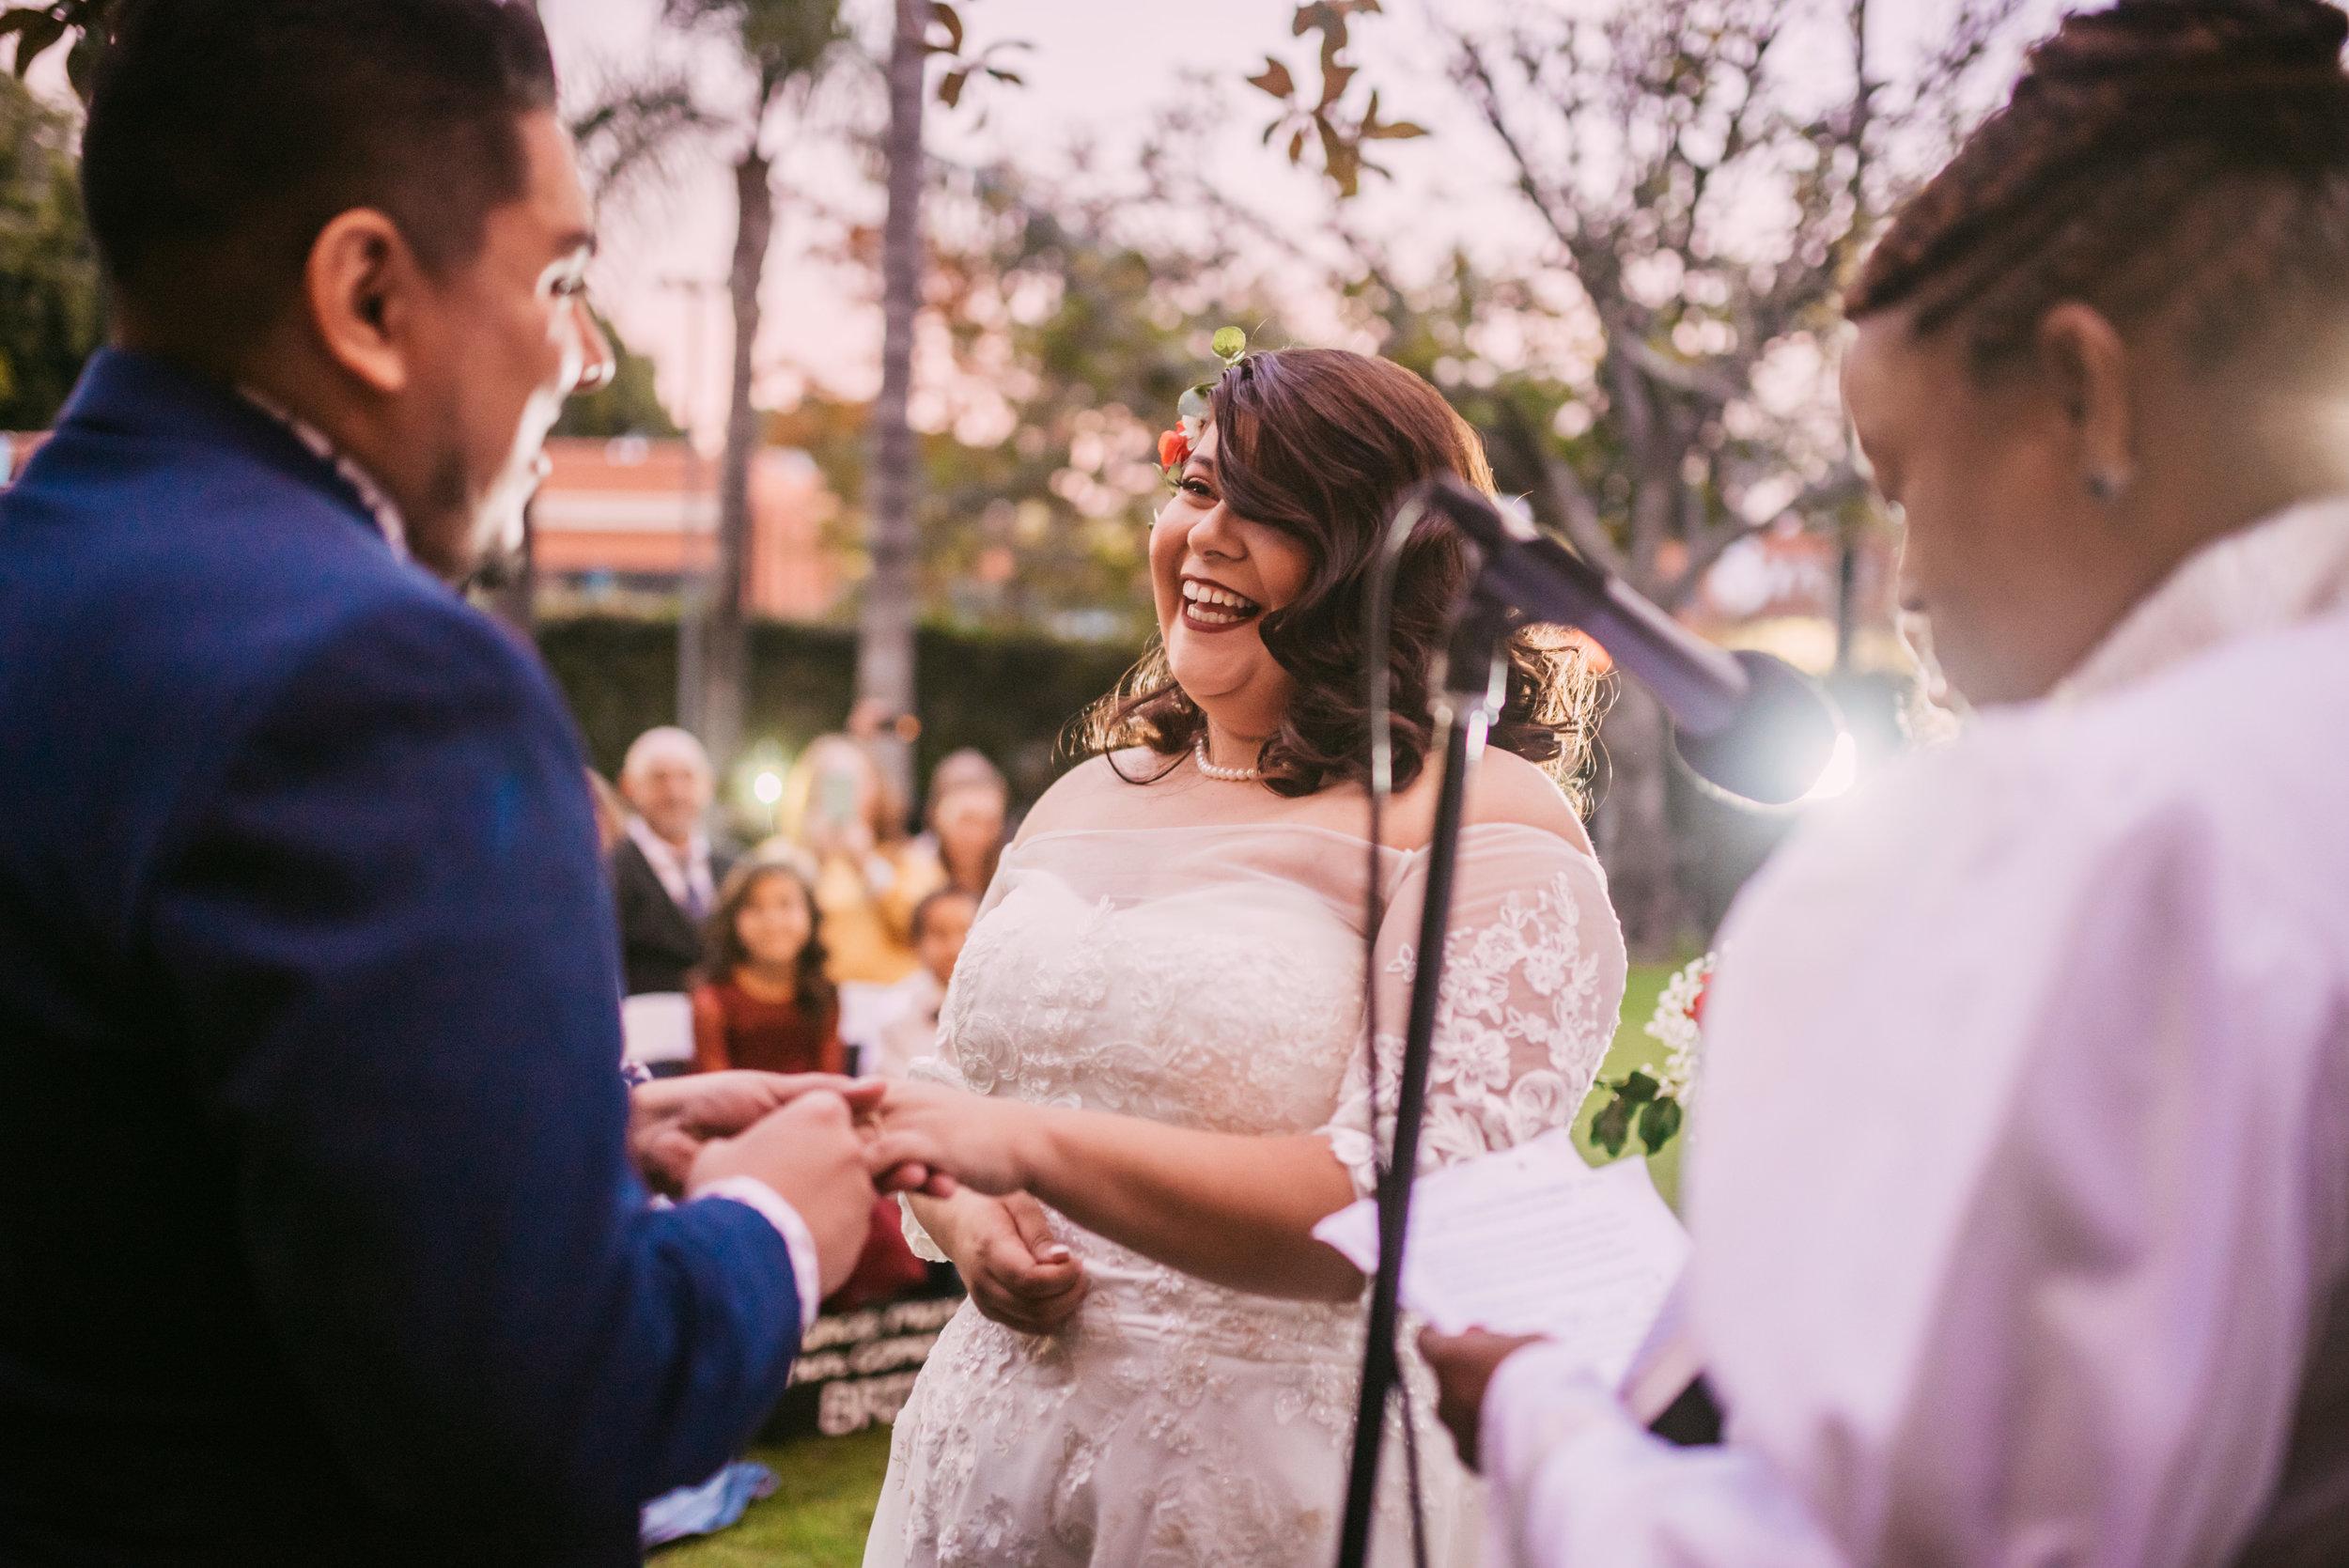 natalie-wedding-green-castle-pasadena-disney-theme-1-3.jpg